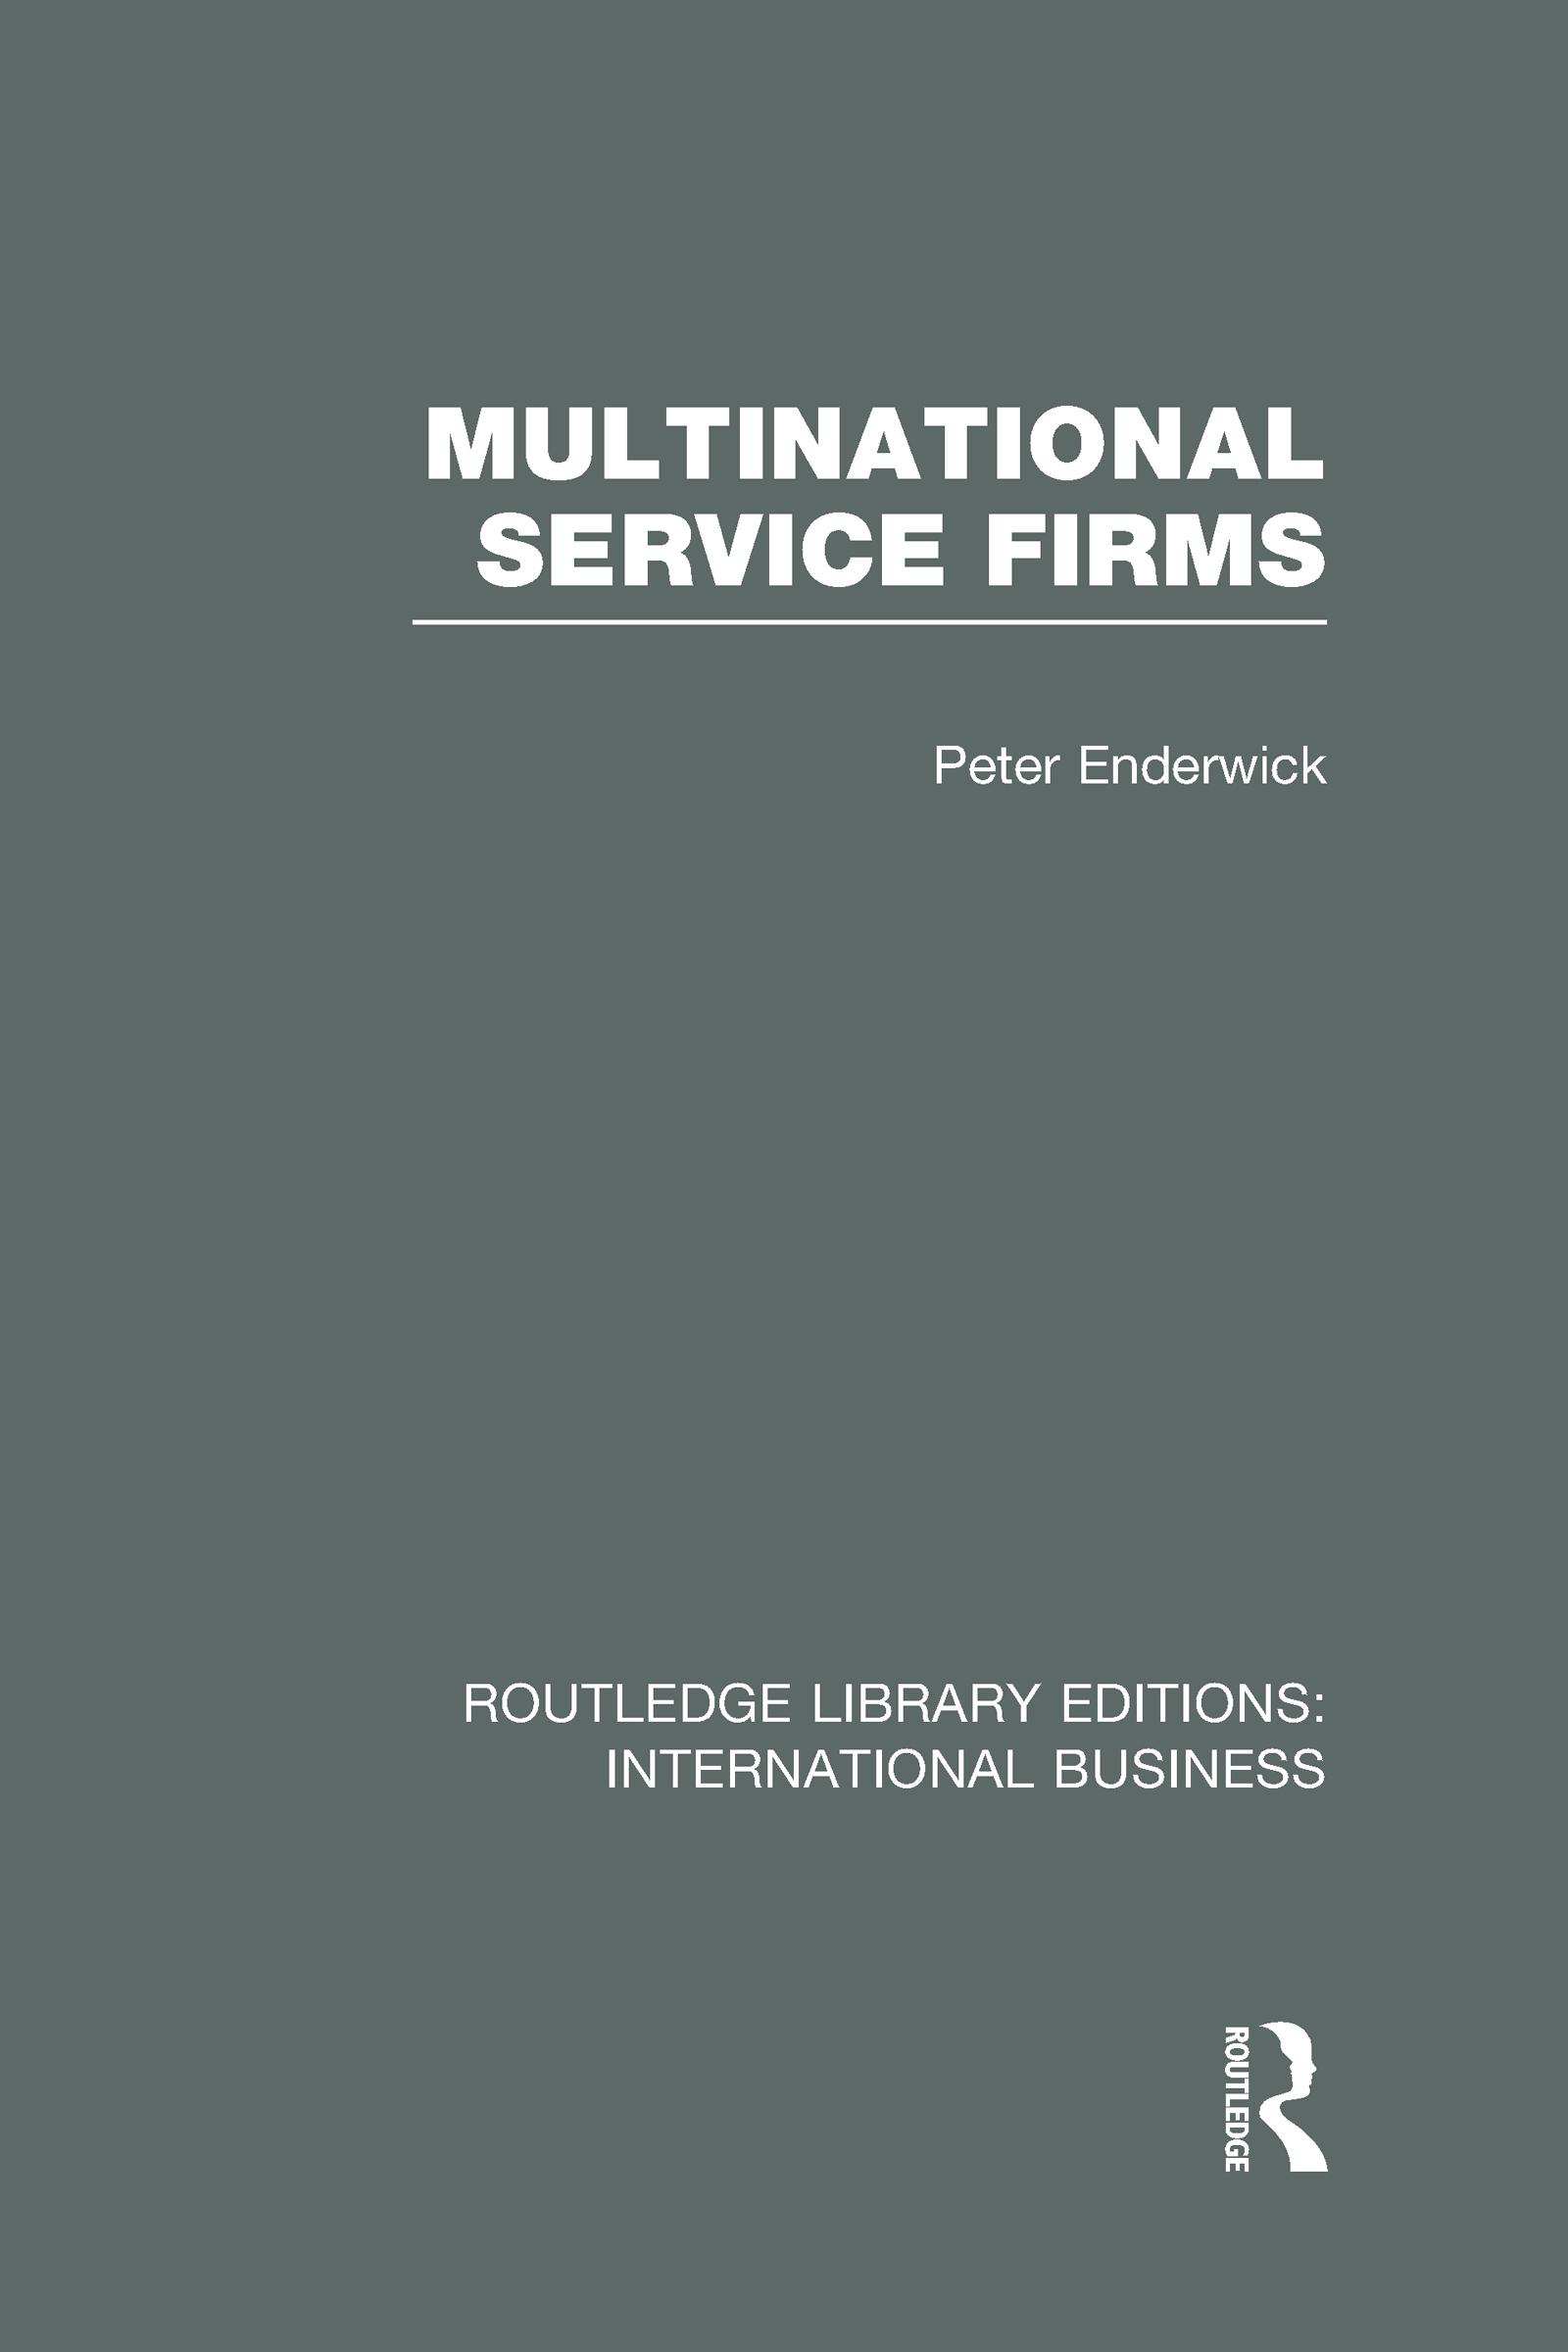 Multinational Service Firms (RLE International Business) (Hardback) book cover